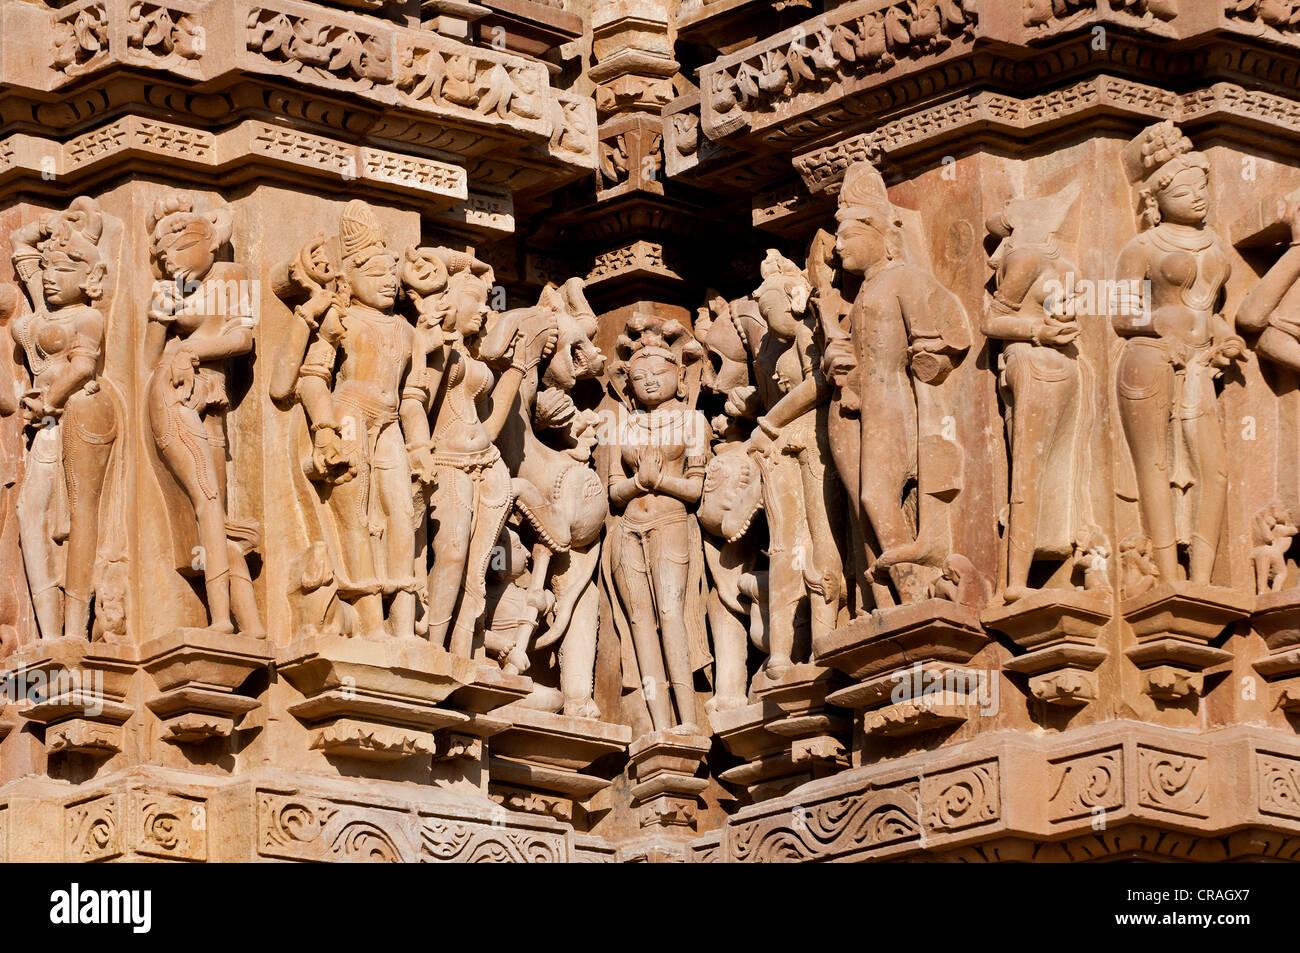 Decorative sculptures, Hindu deities, Khajuraho Group of Monuments, UNESCO World Heritage Site, Madhya Pradesh, - Stock Image